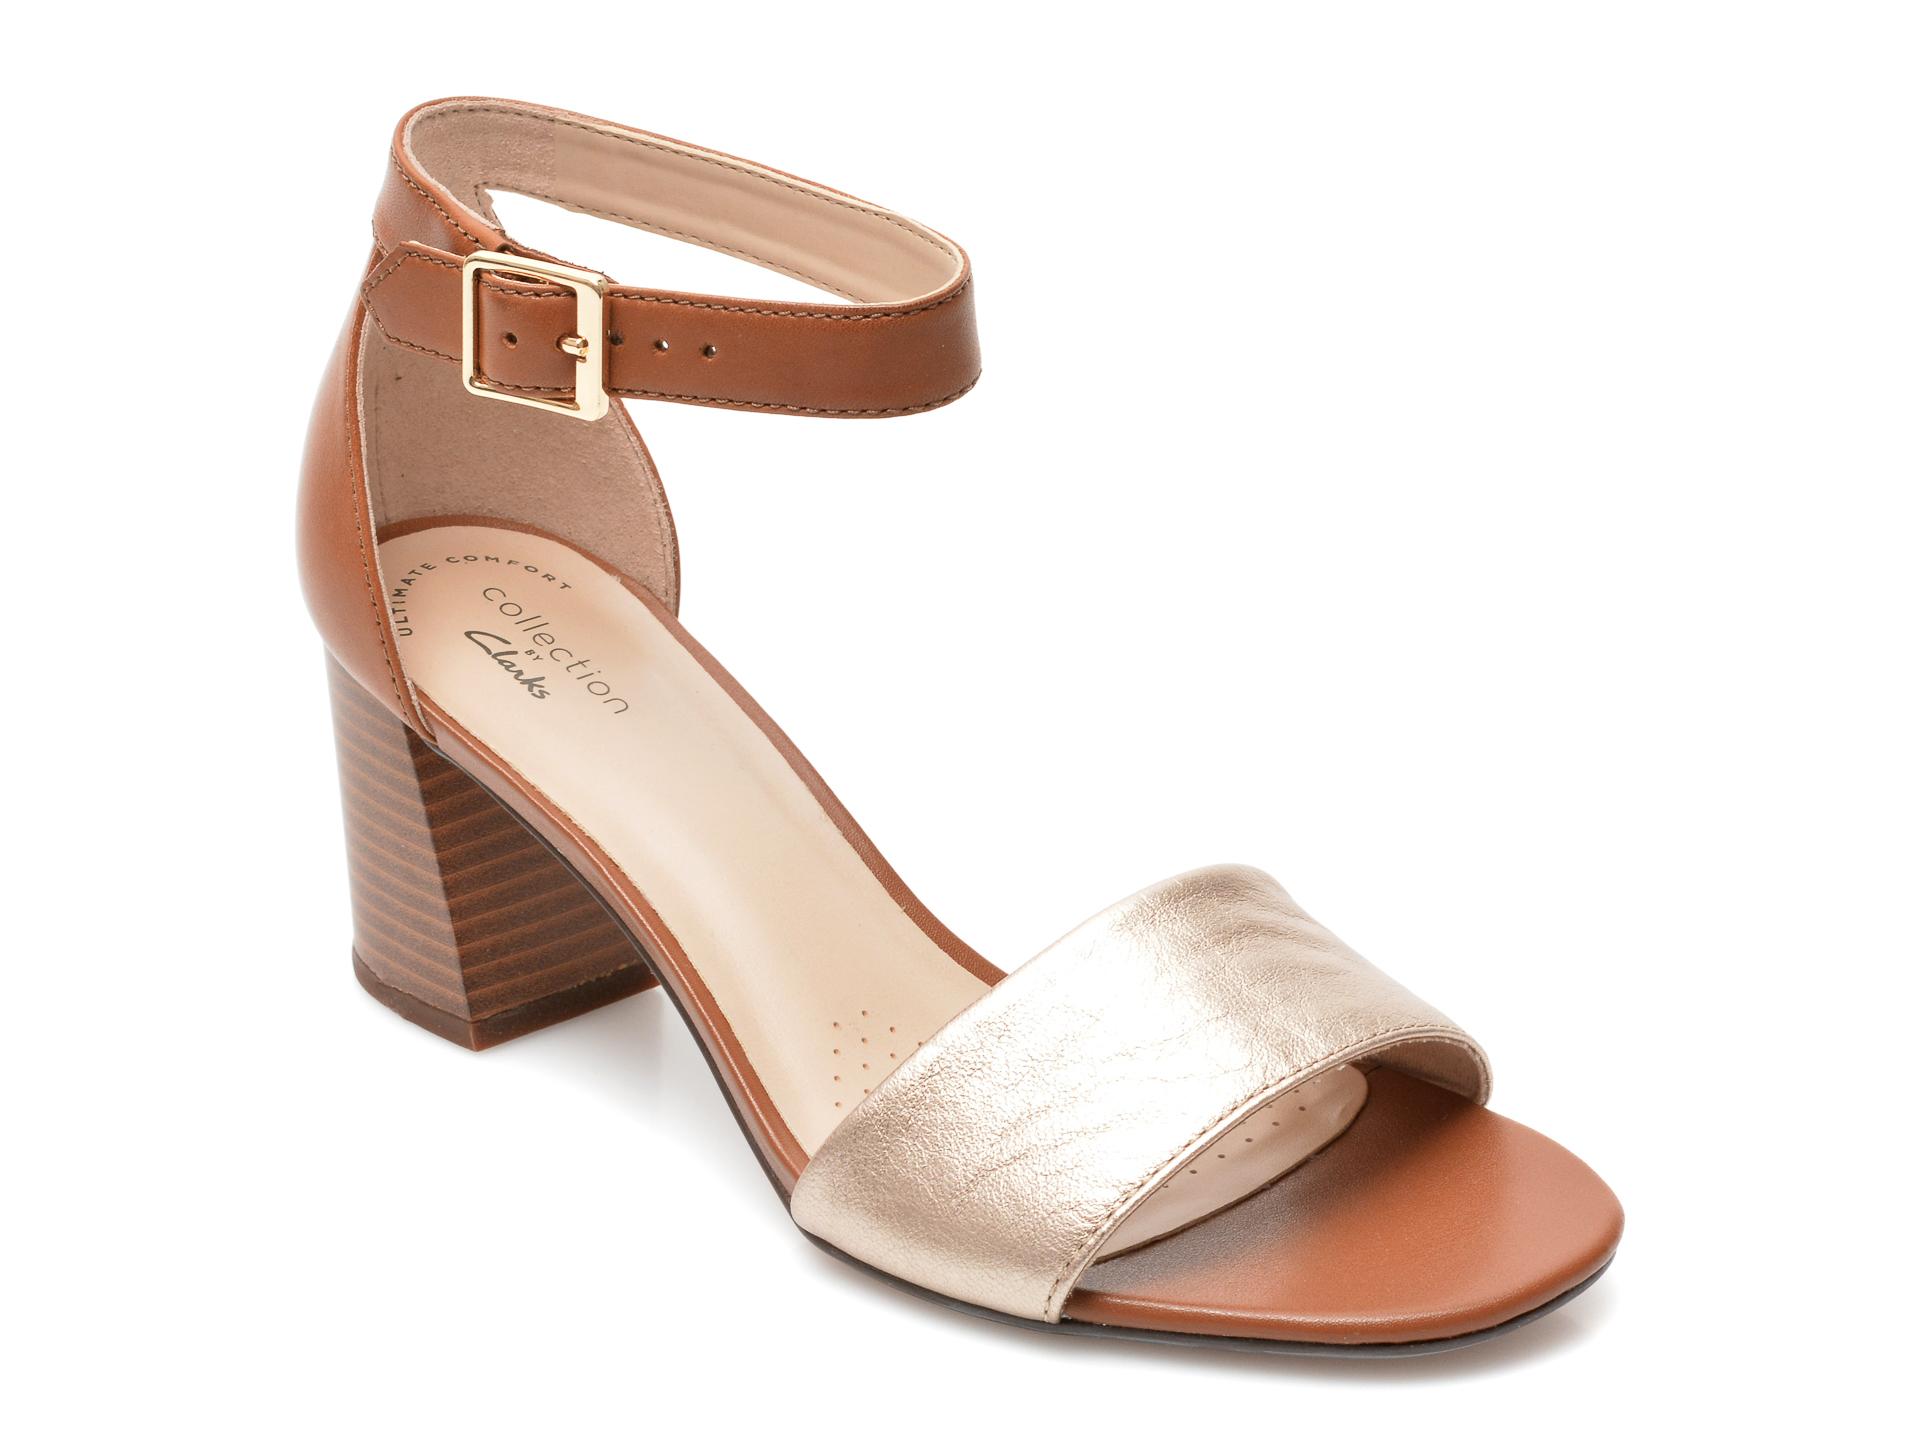 Sandale CLARKS negre, Arla Jacory, din piele ecologica